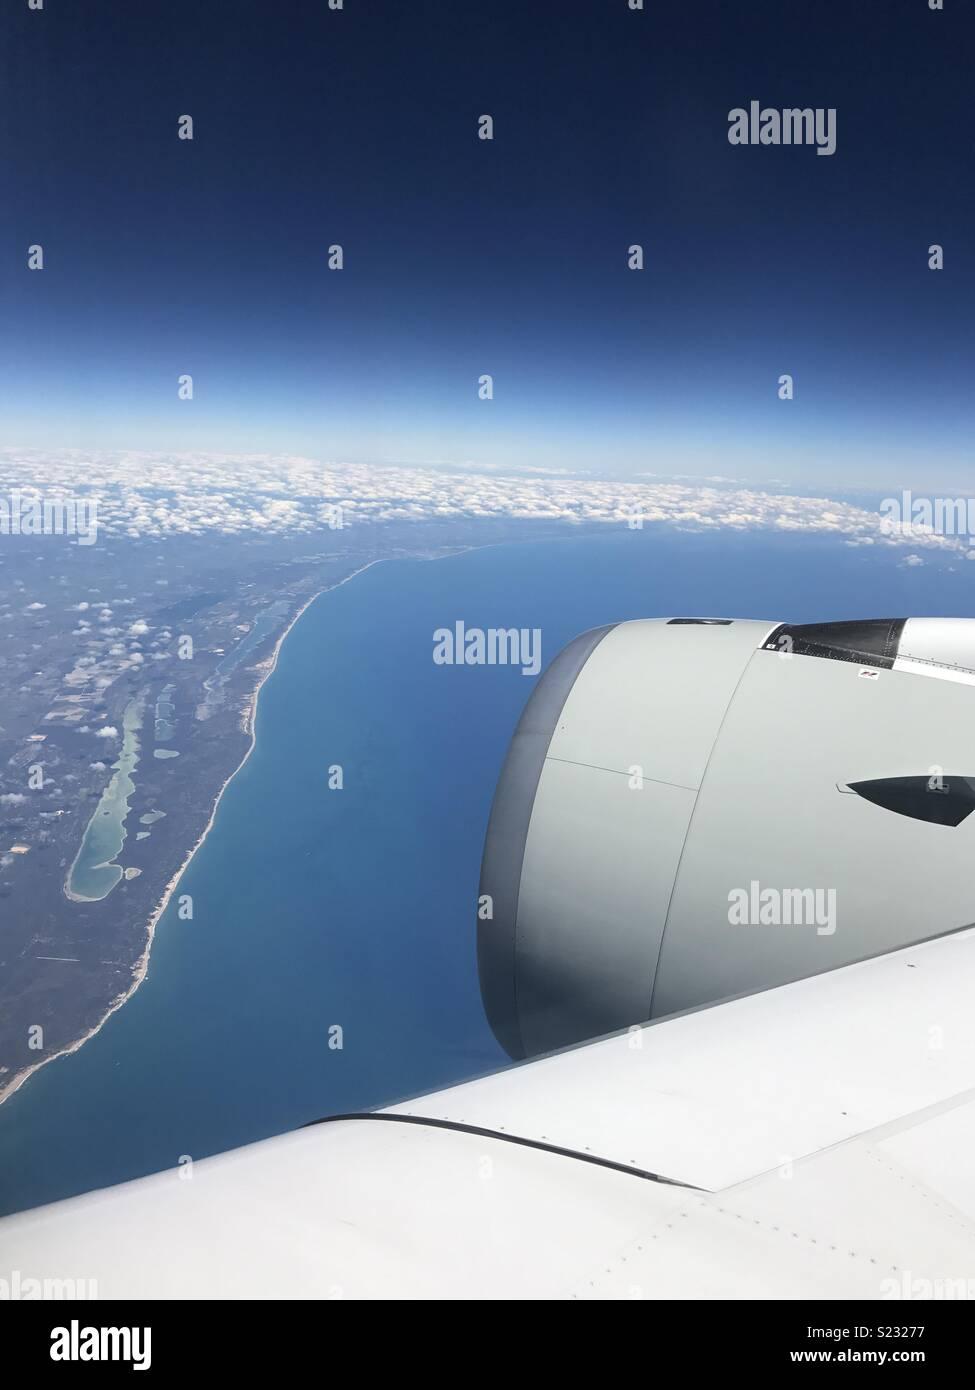 East coast Australia from 40,000 feet - Stock Image